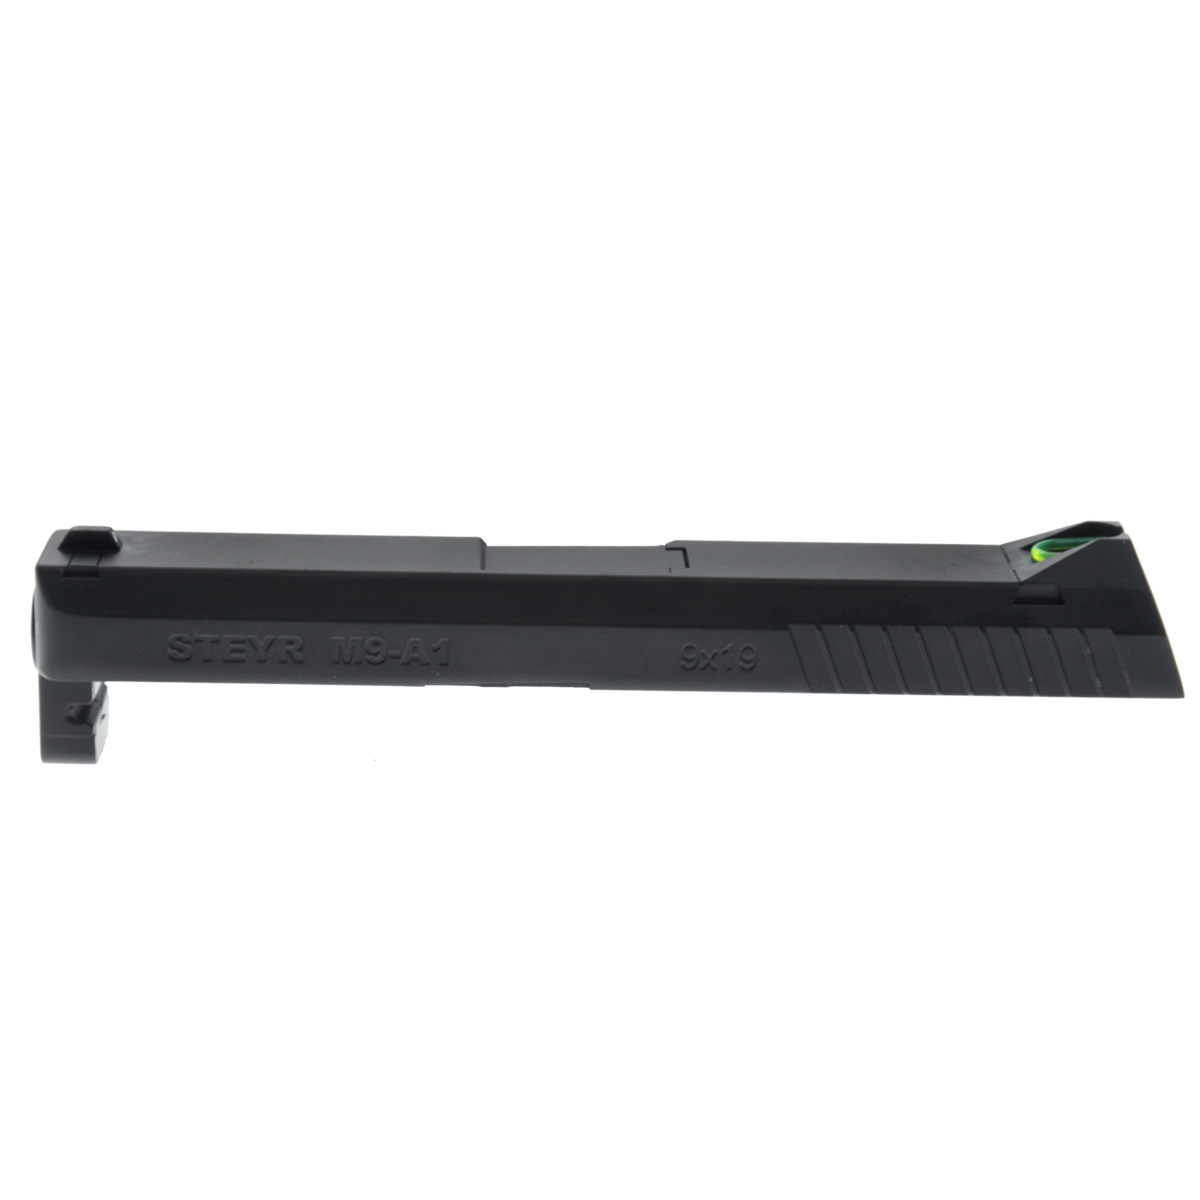 Верхняя крышка для ASG Steyr M9-A1, цвет: Black (16562) чехлы накладки для телефонов кпк pumaixin htc one m9 htc m9 hct m9 m9 leather case